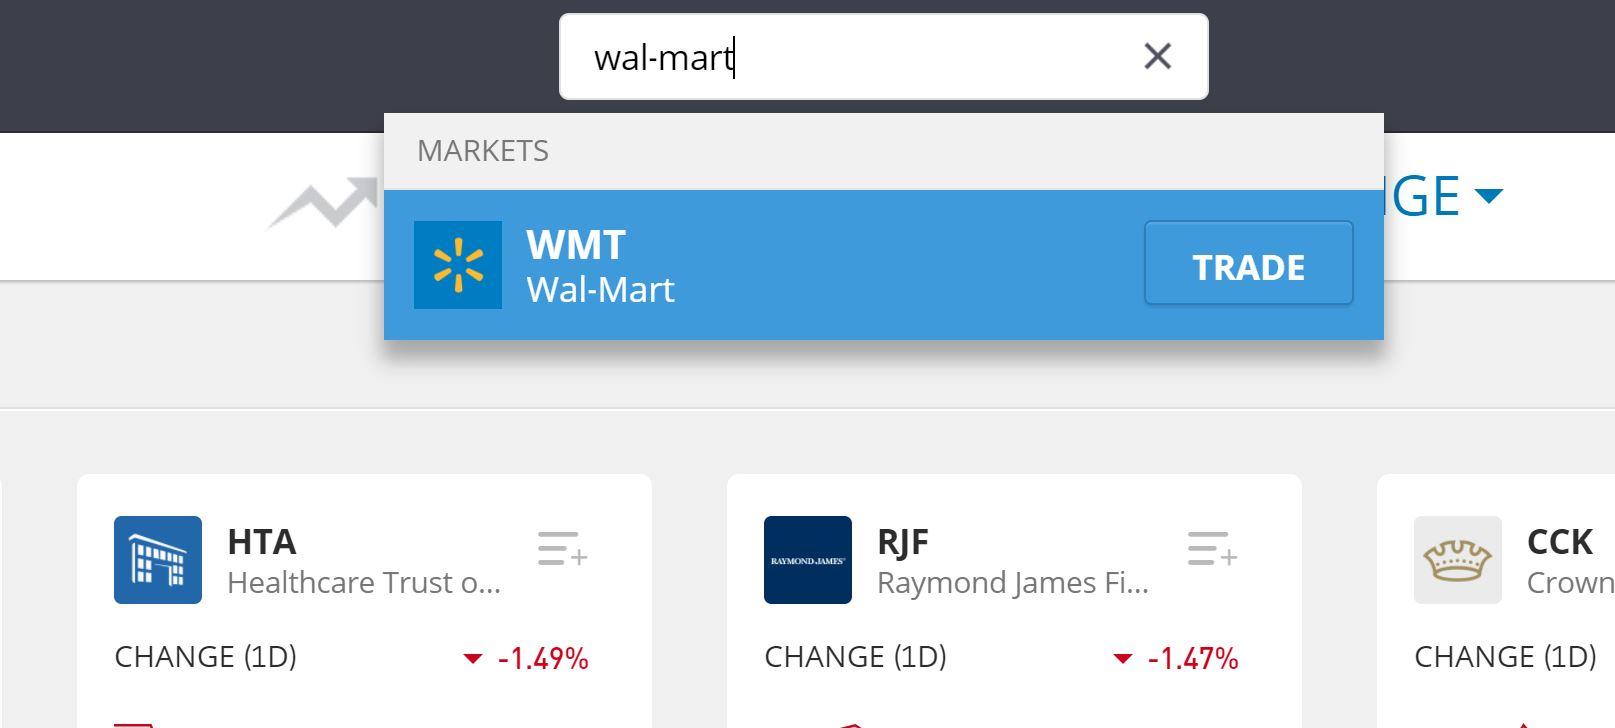 Search Walmart on eToro